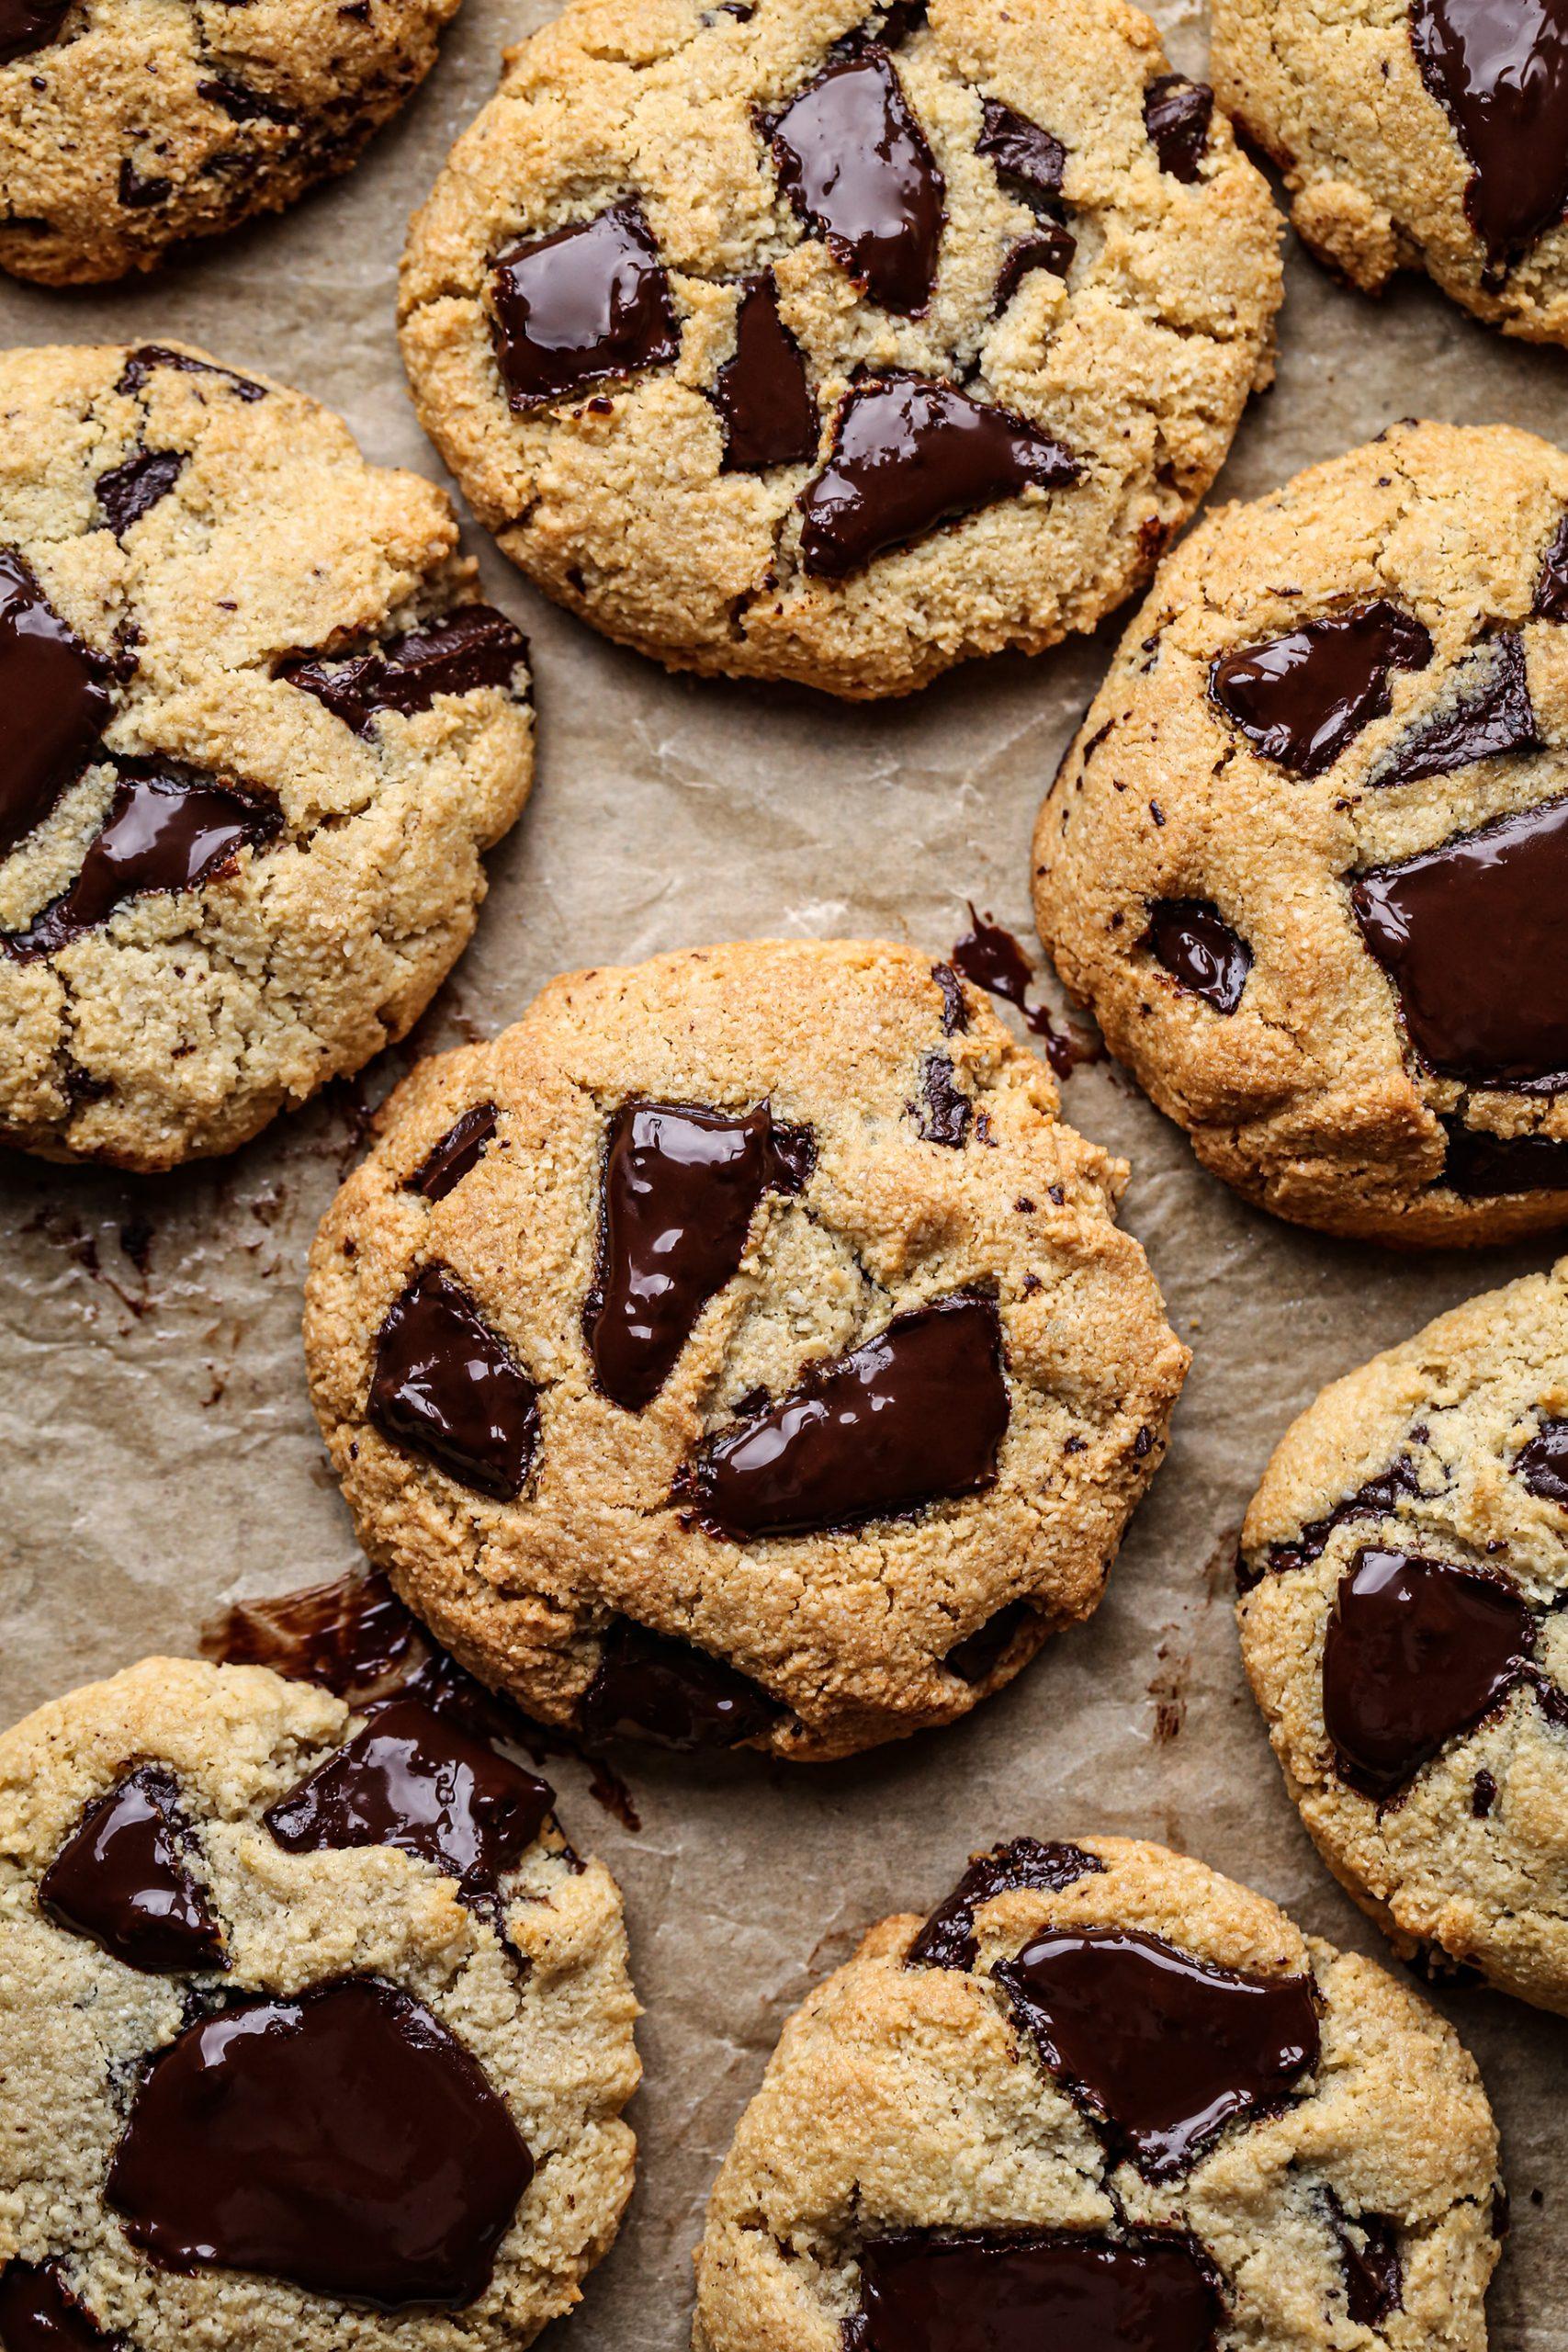 Paleo and Vegan Chocolate Chip Cookies